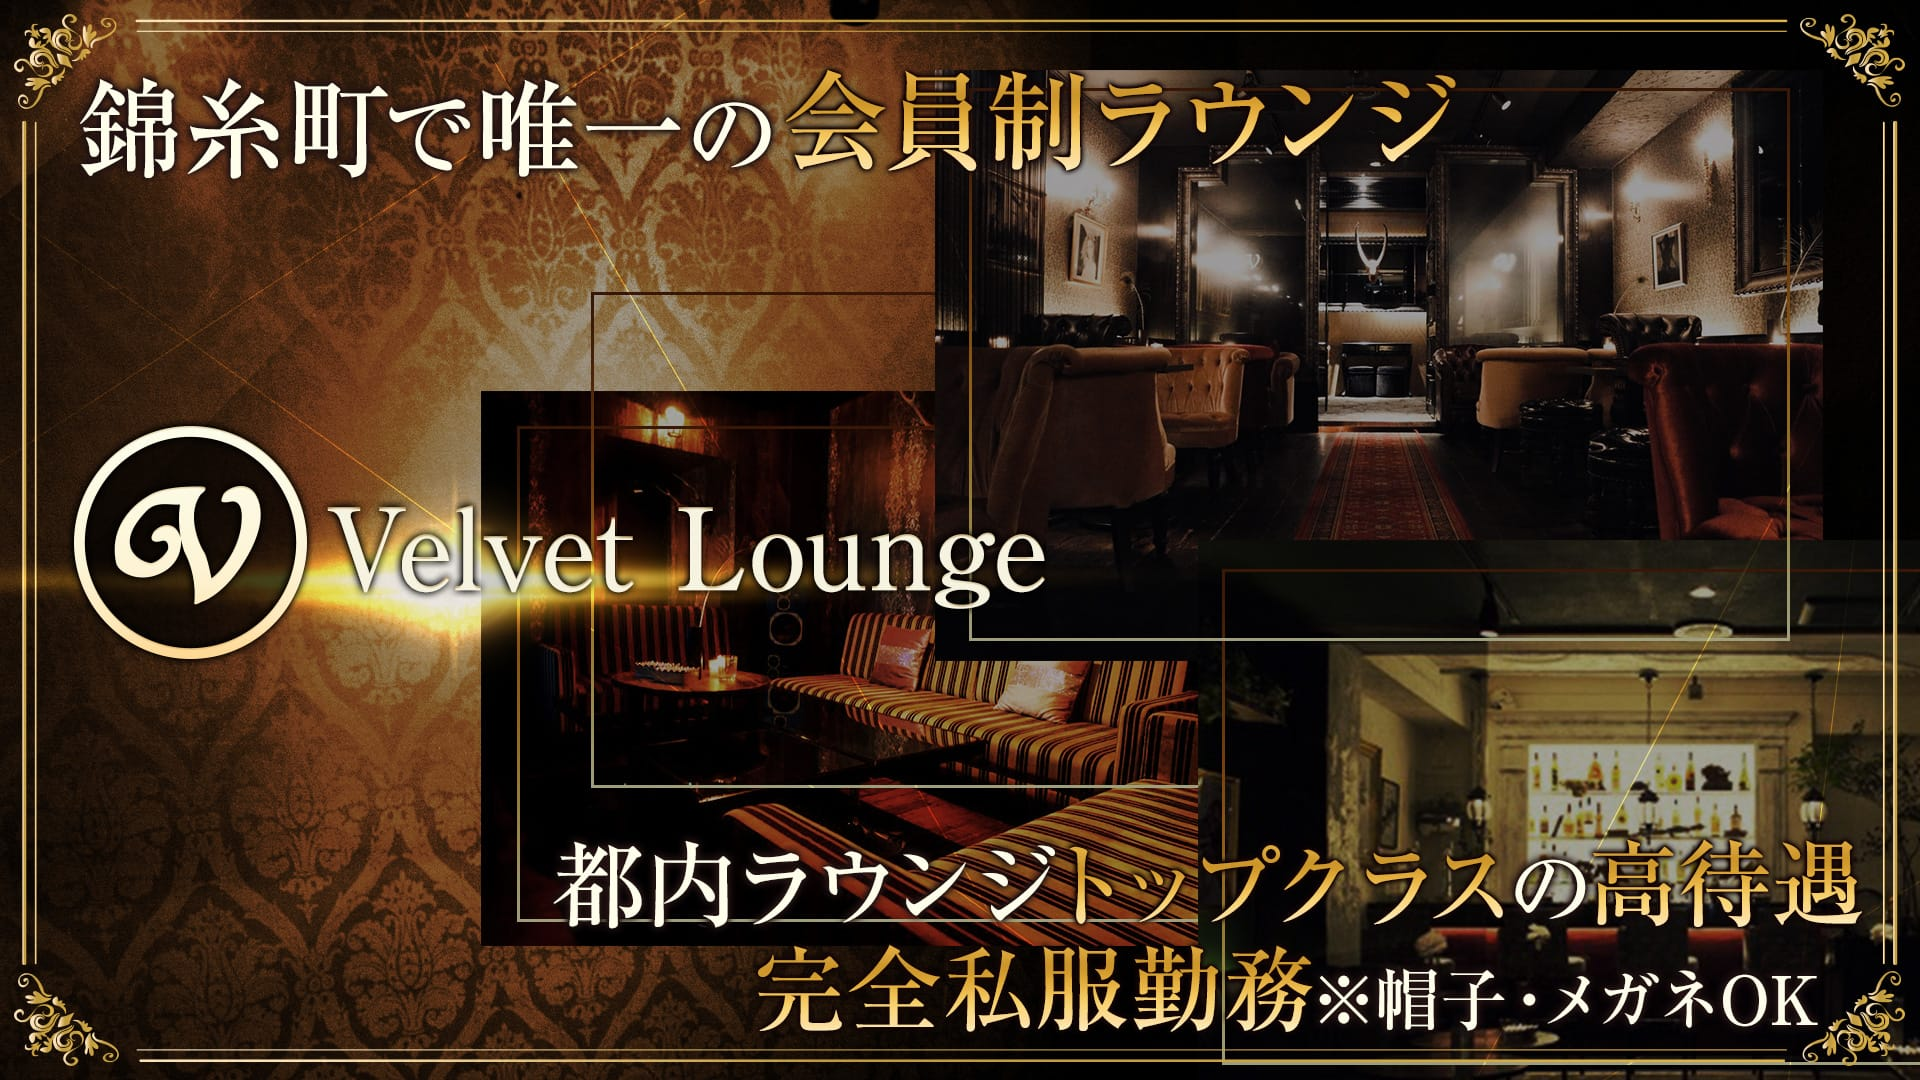 Velvet Lounge (ベルベットラウンジ) 錦糸町キャバクラ TOP画像